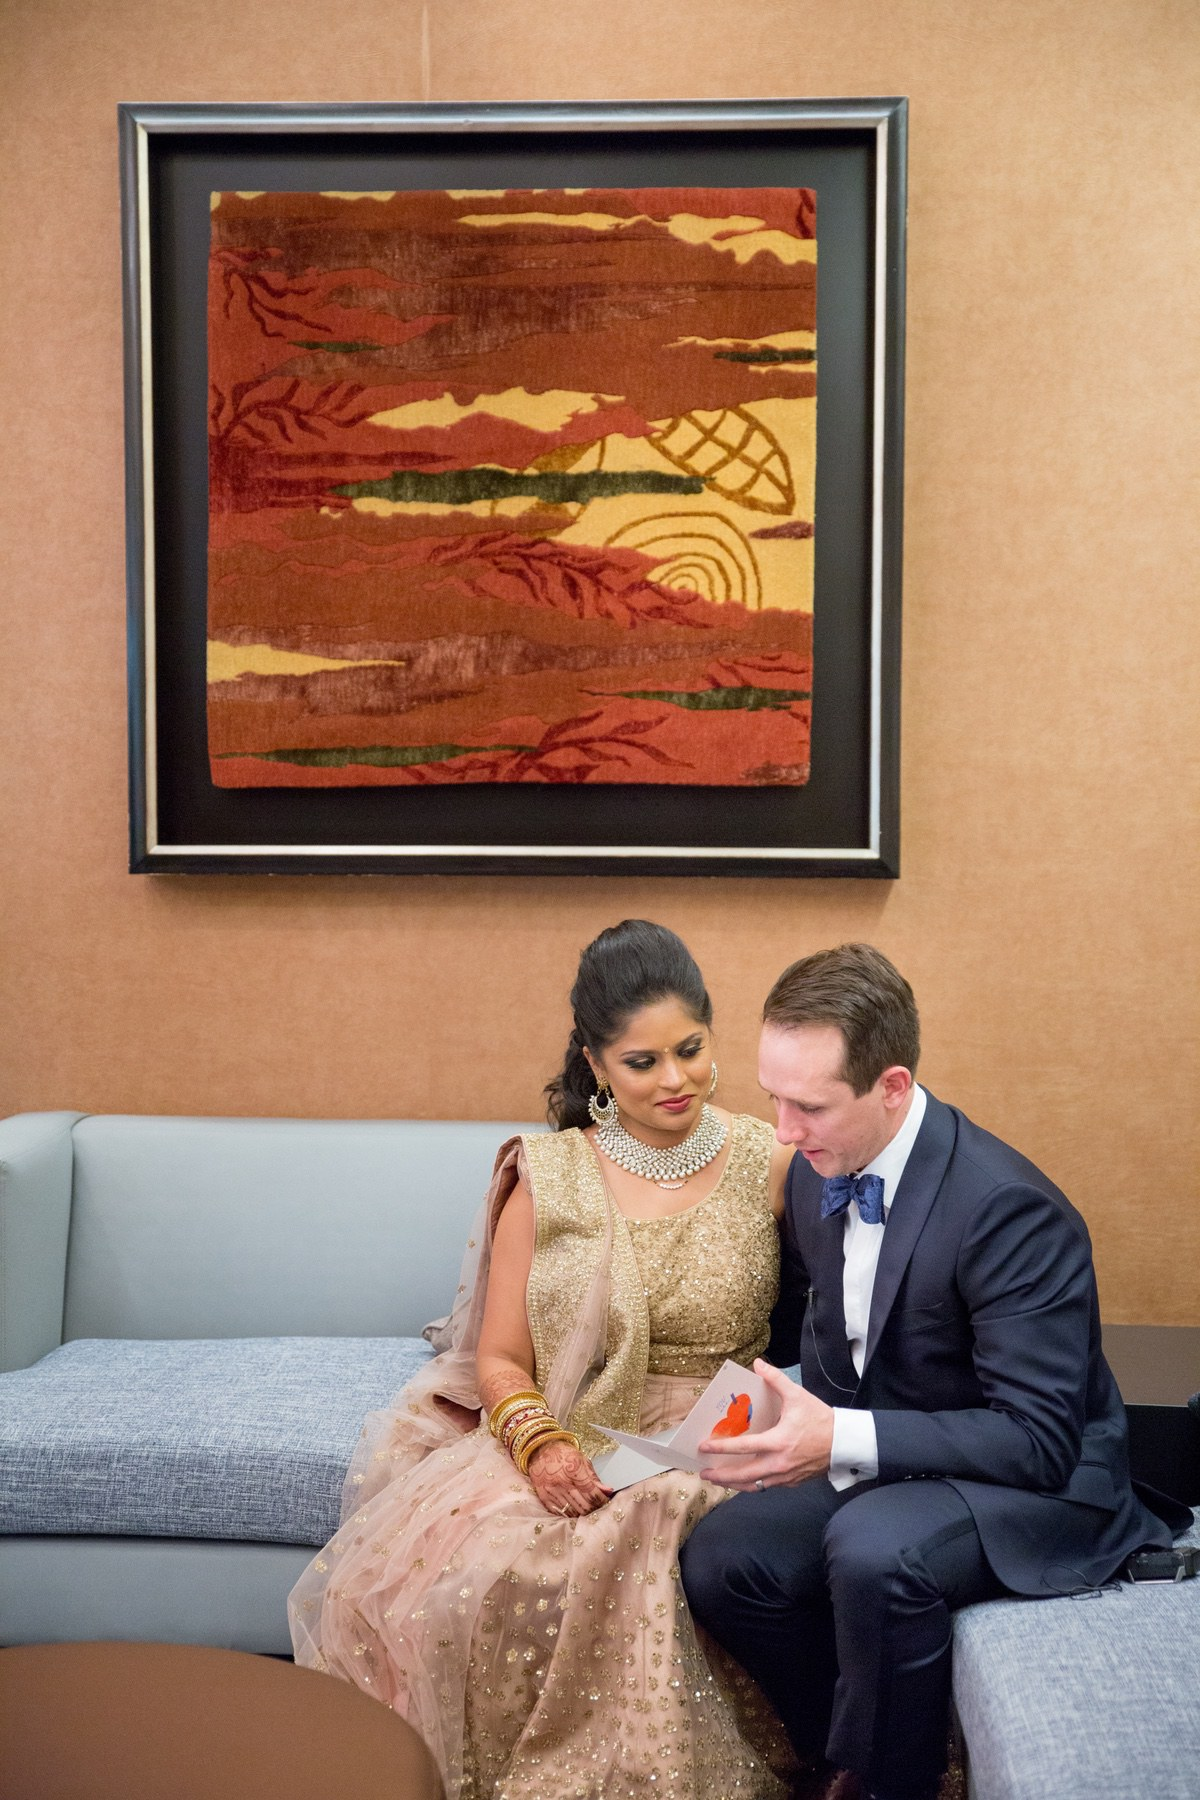 Le Cape Weddings - South Asian Wedding - Trisha and Jordan - Love Letters -8.jpg